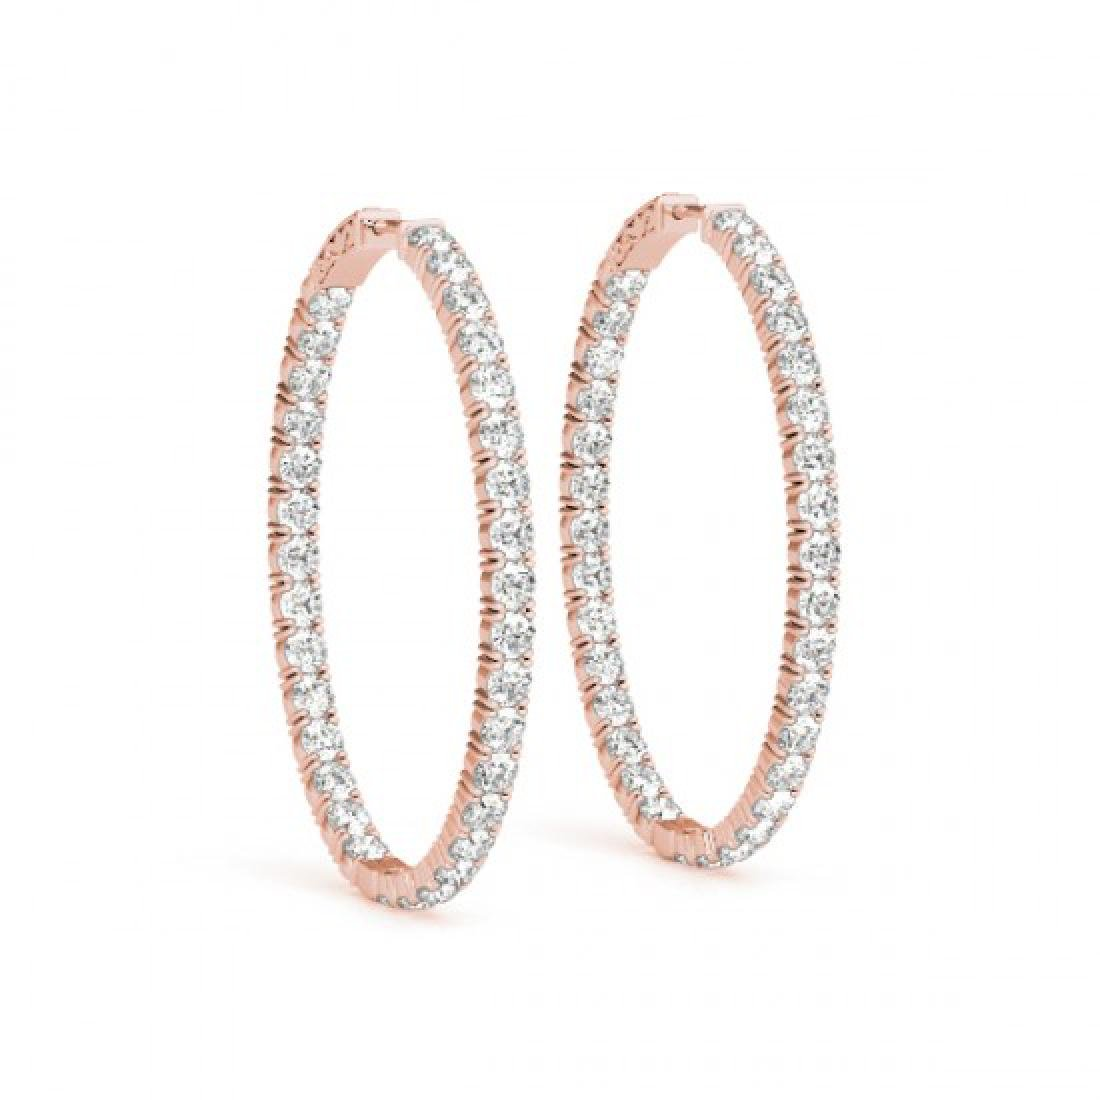 3 CTW Diamond VS/SI Certified 20 Mm Hoop Earrings 14K - 2